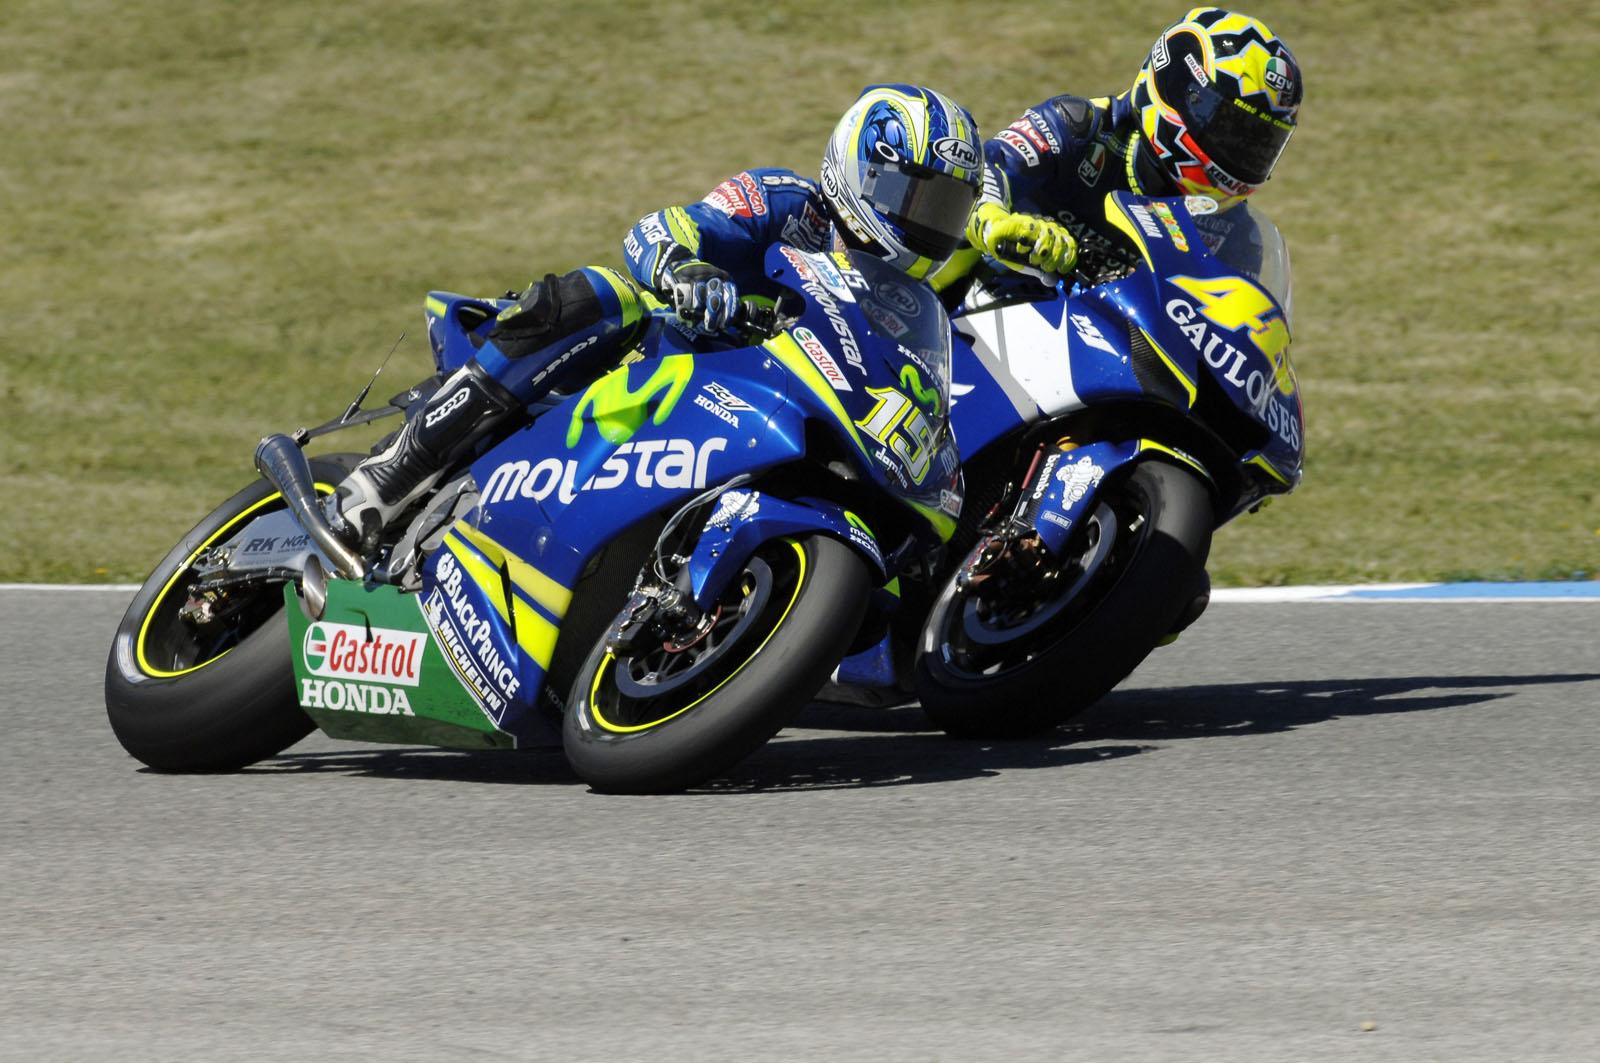 Rossi-Gibernau-2005-03.jpg